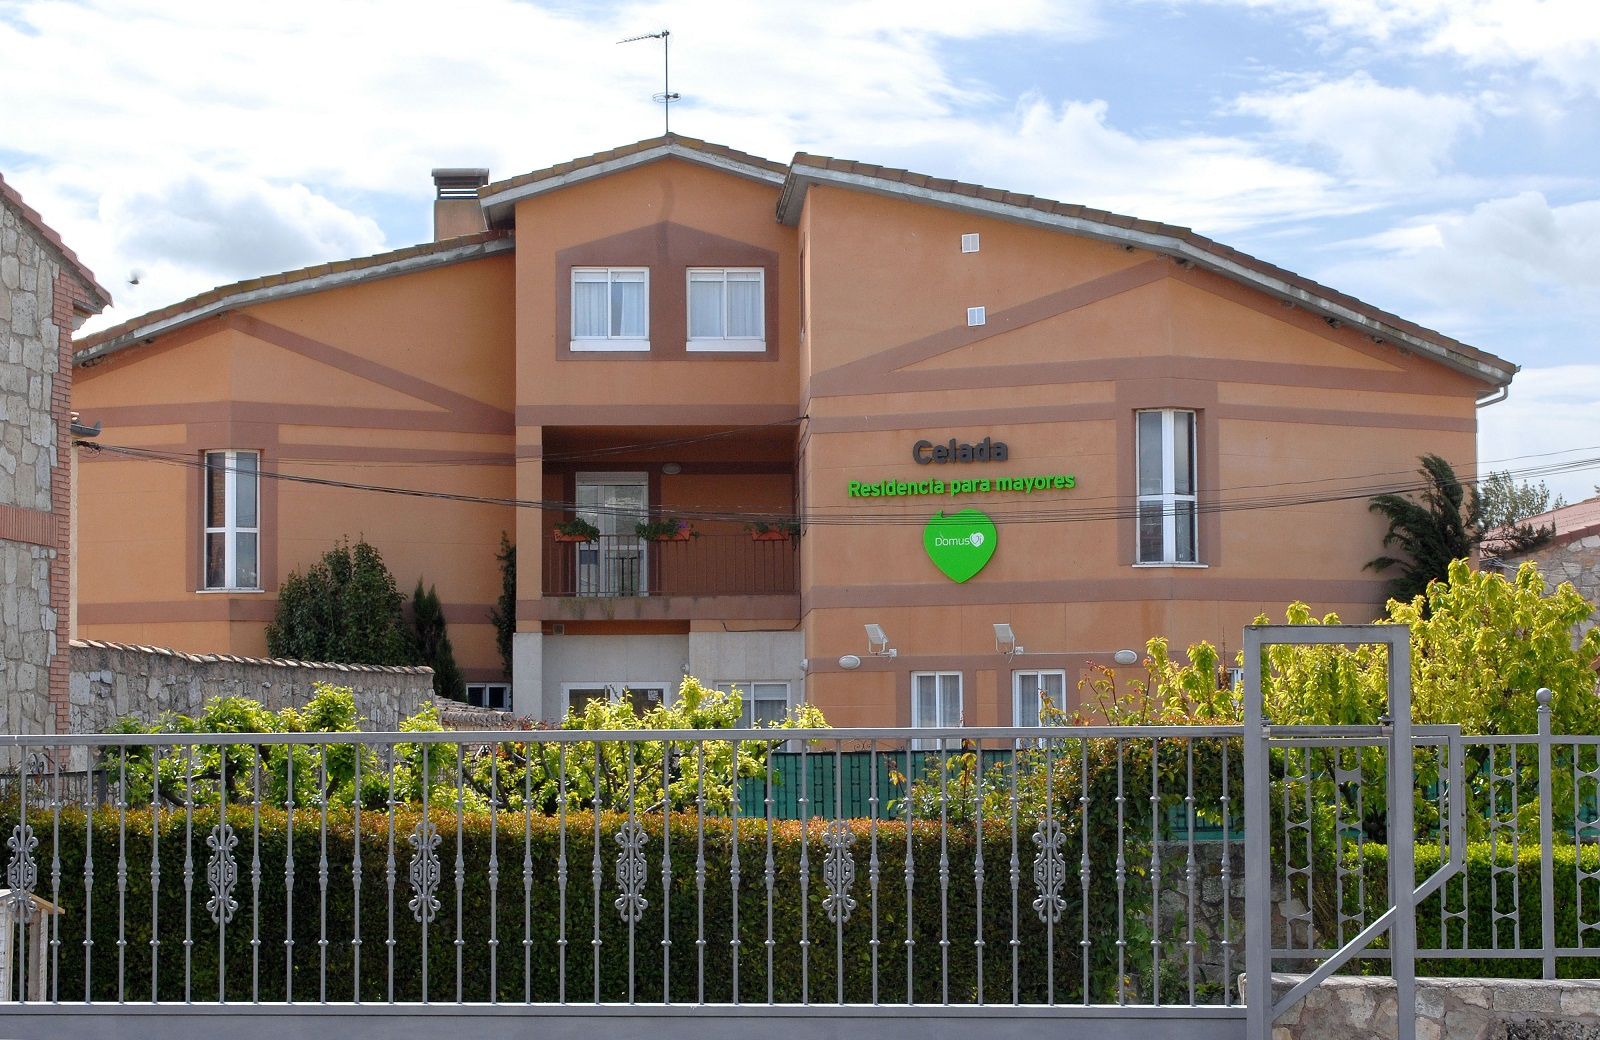 Residencia para mayores Celada, Burgos